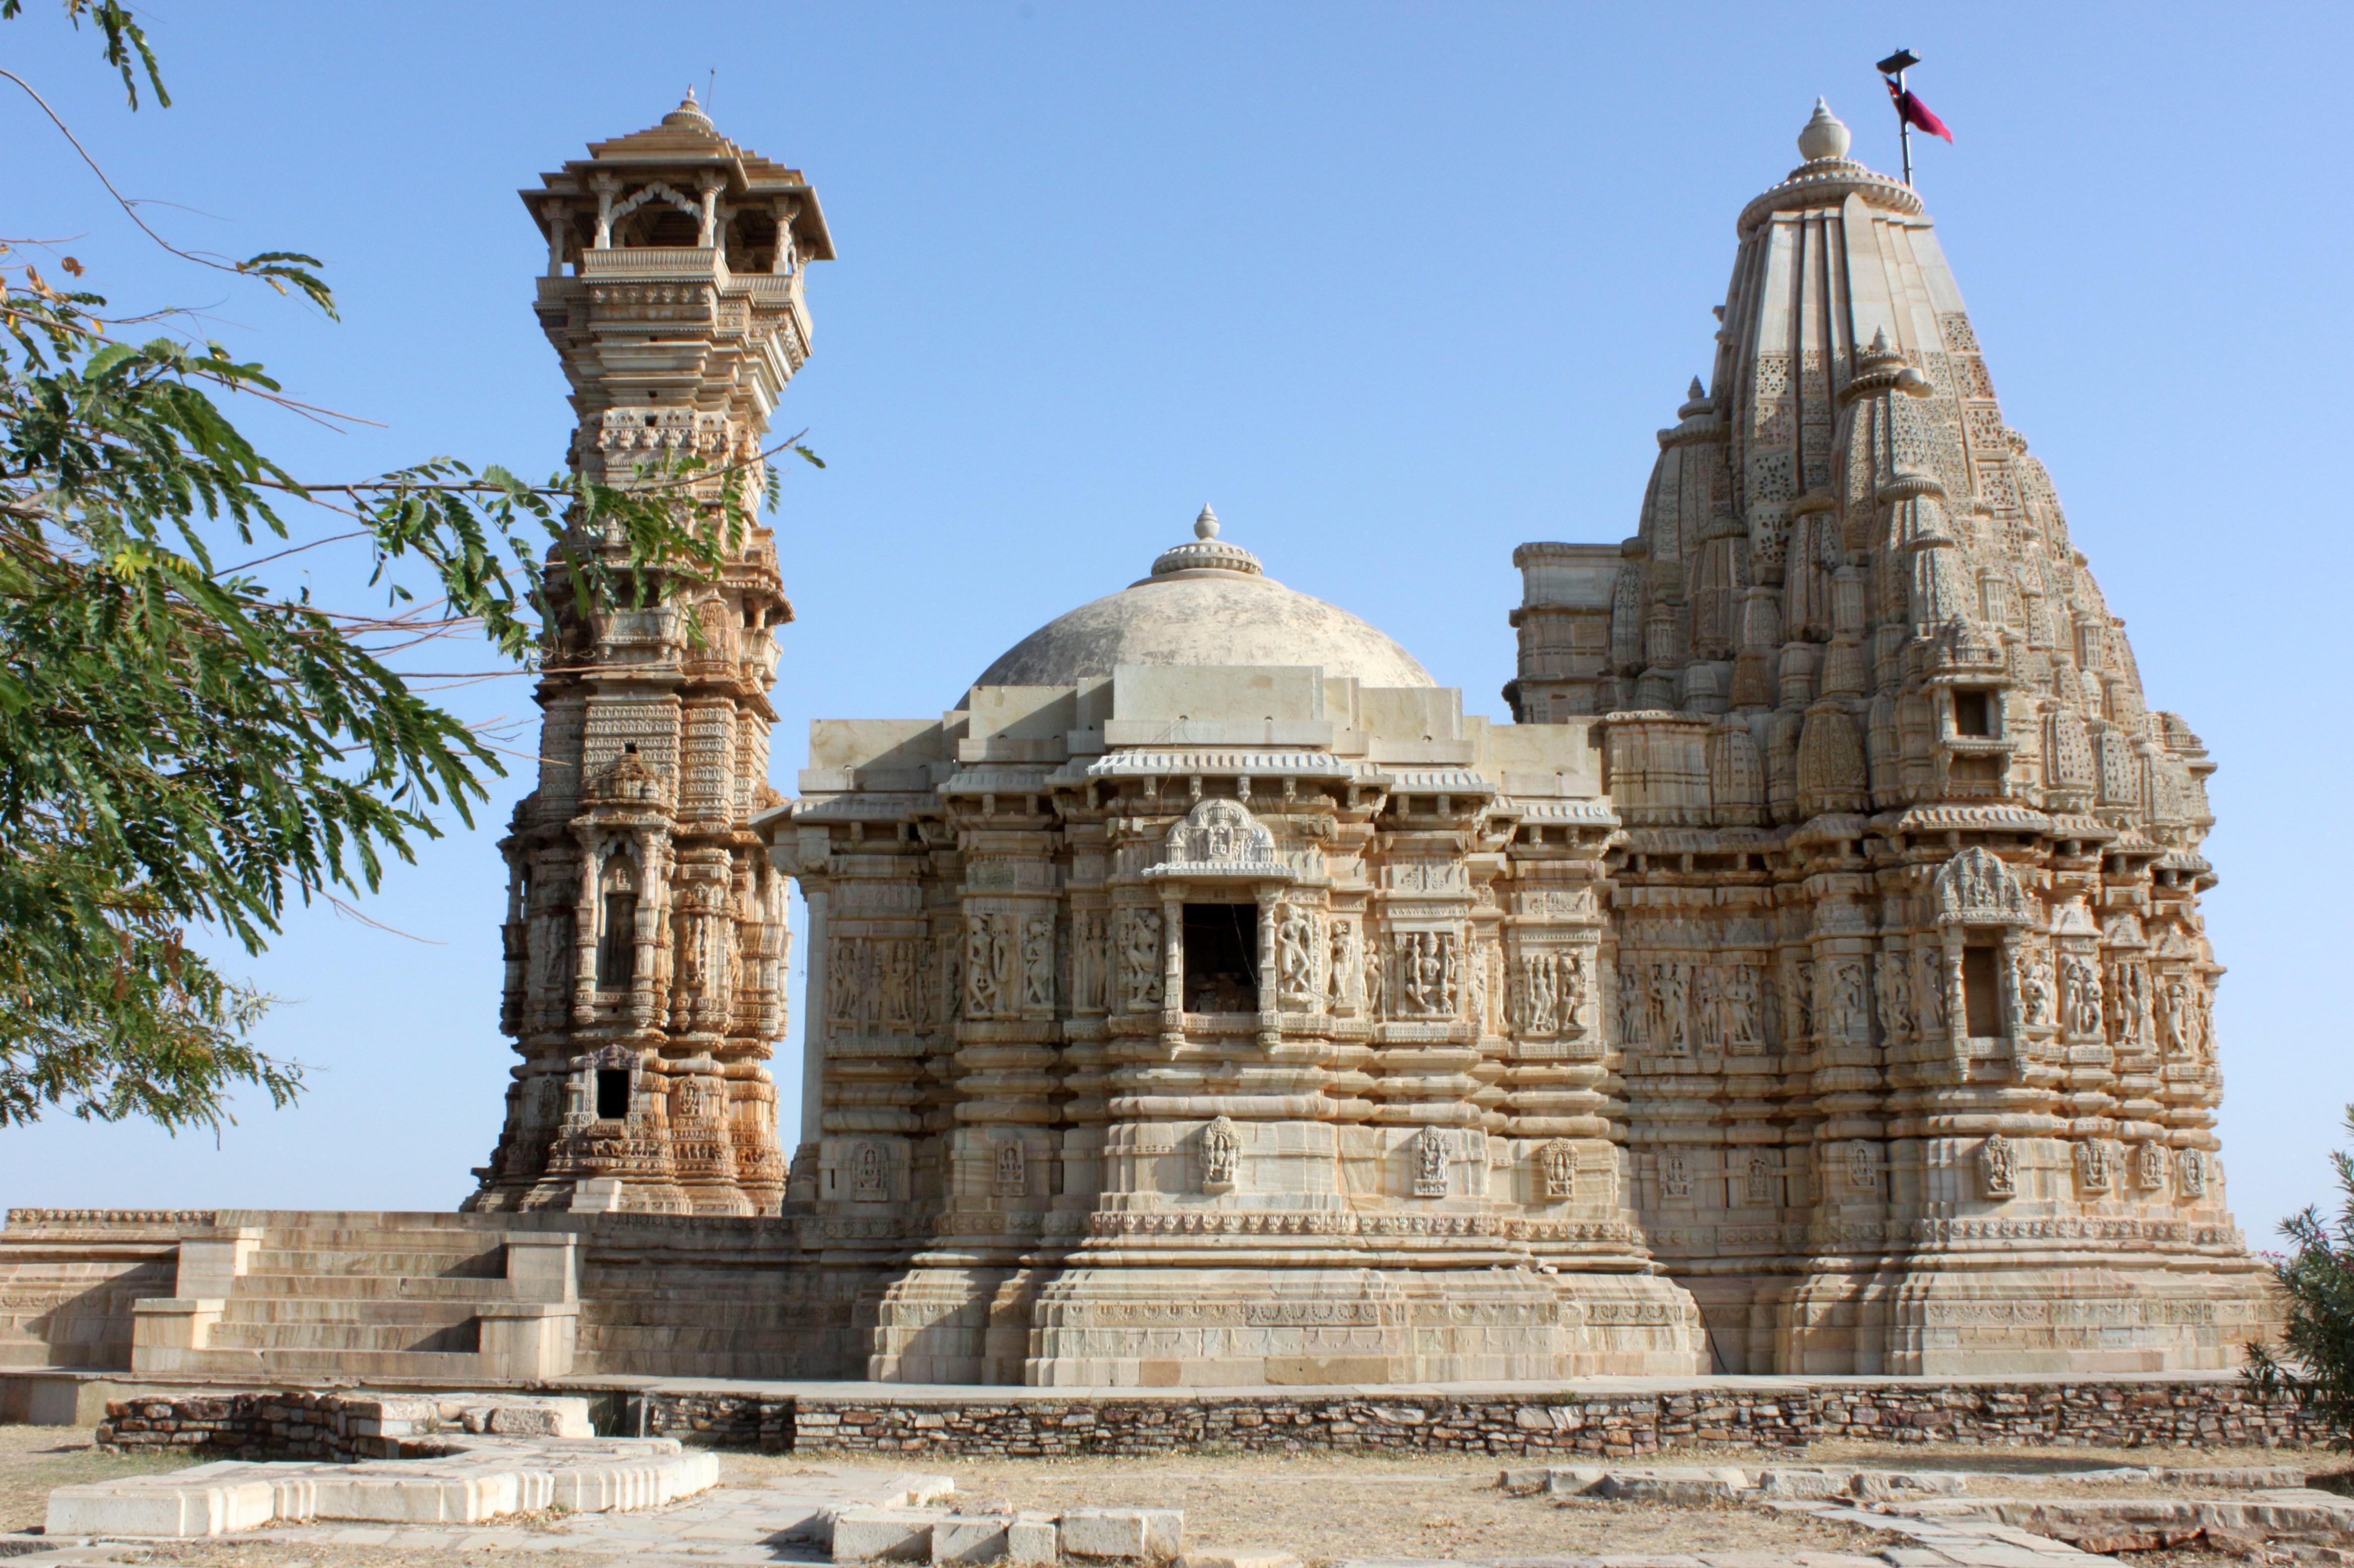 Kirti Stambha (Tower of Fame) 12